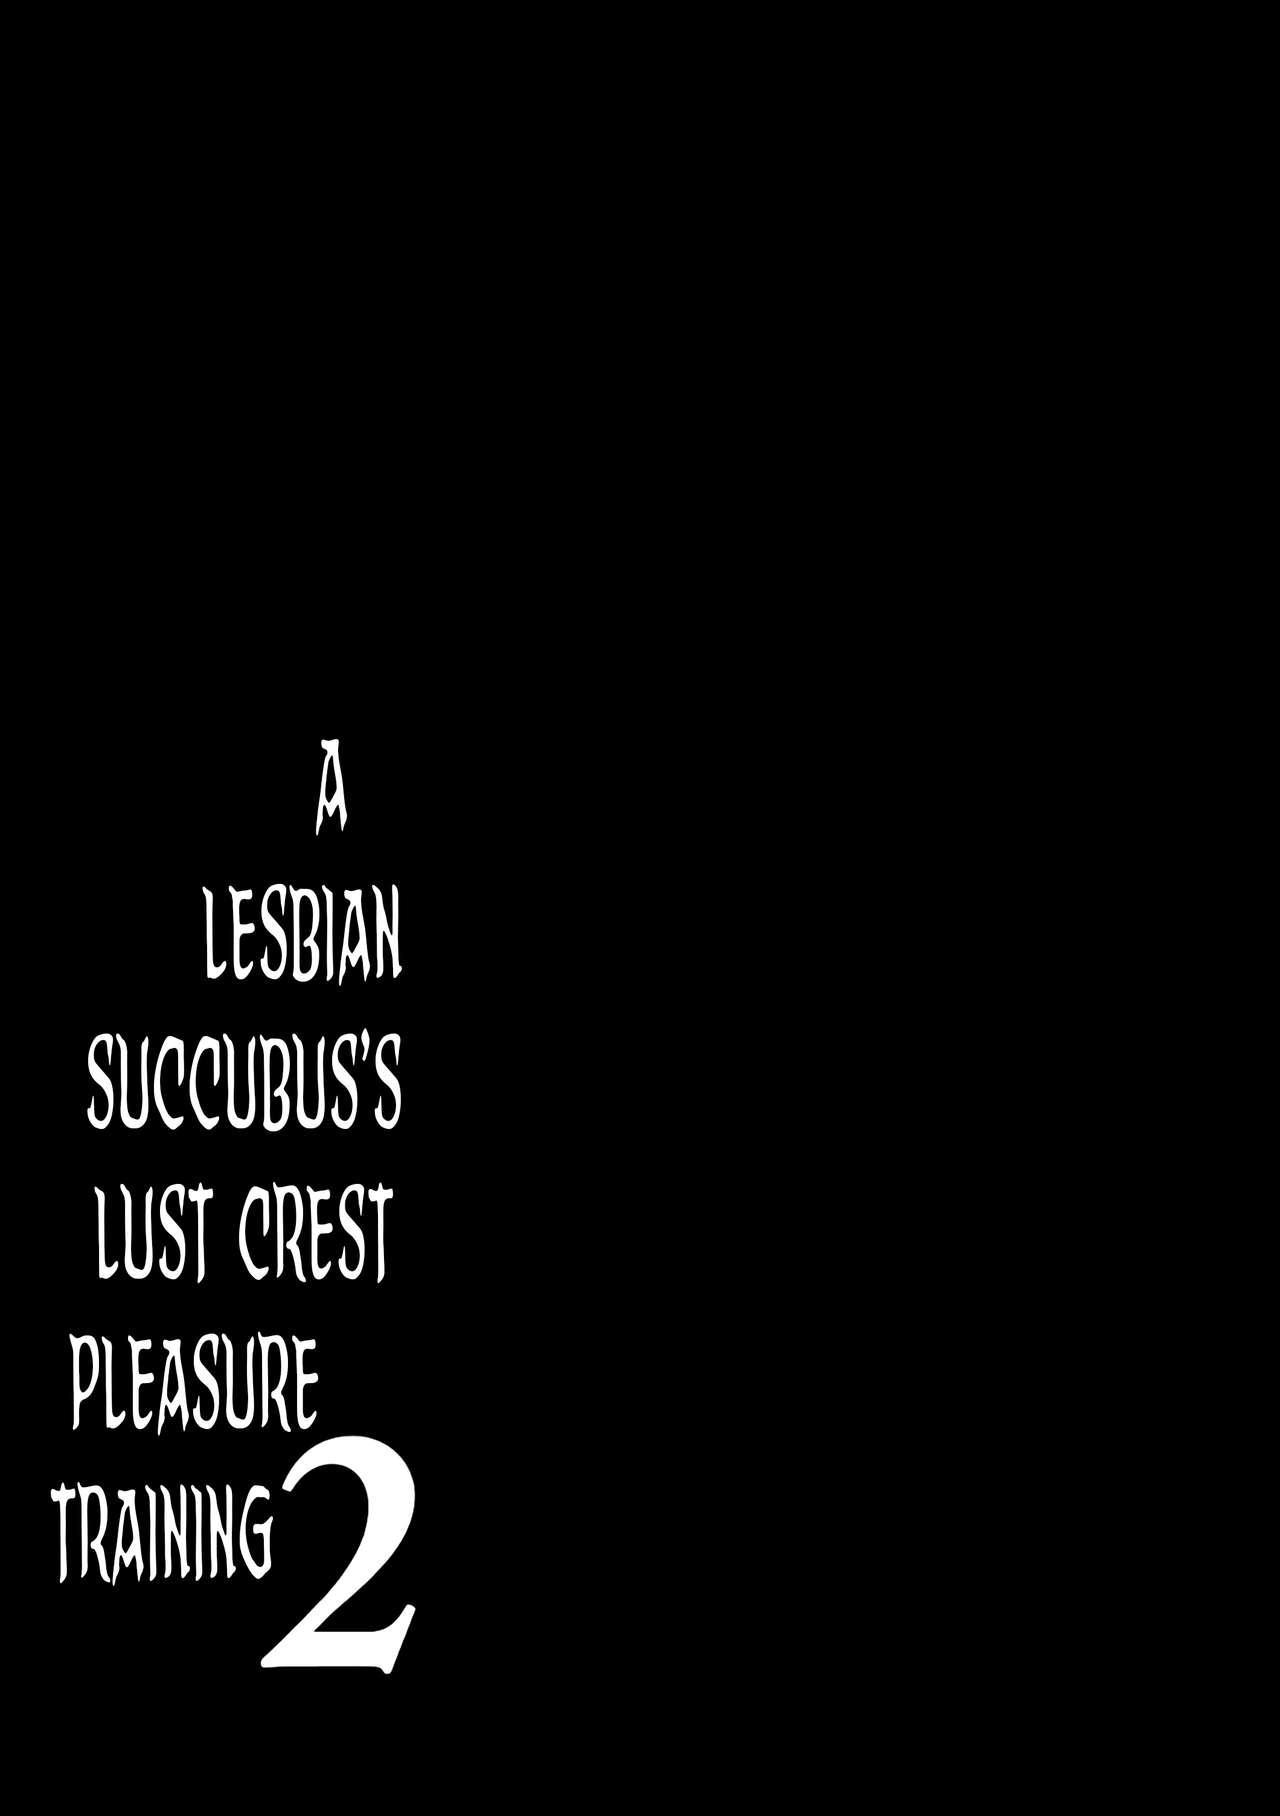 Les Inma no Inmon Kairaku Choukyou 2   A Lesbian Succubus's Lust Crest Pleasure Training 2 21